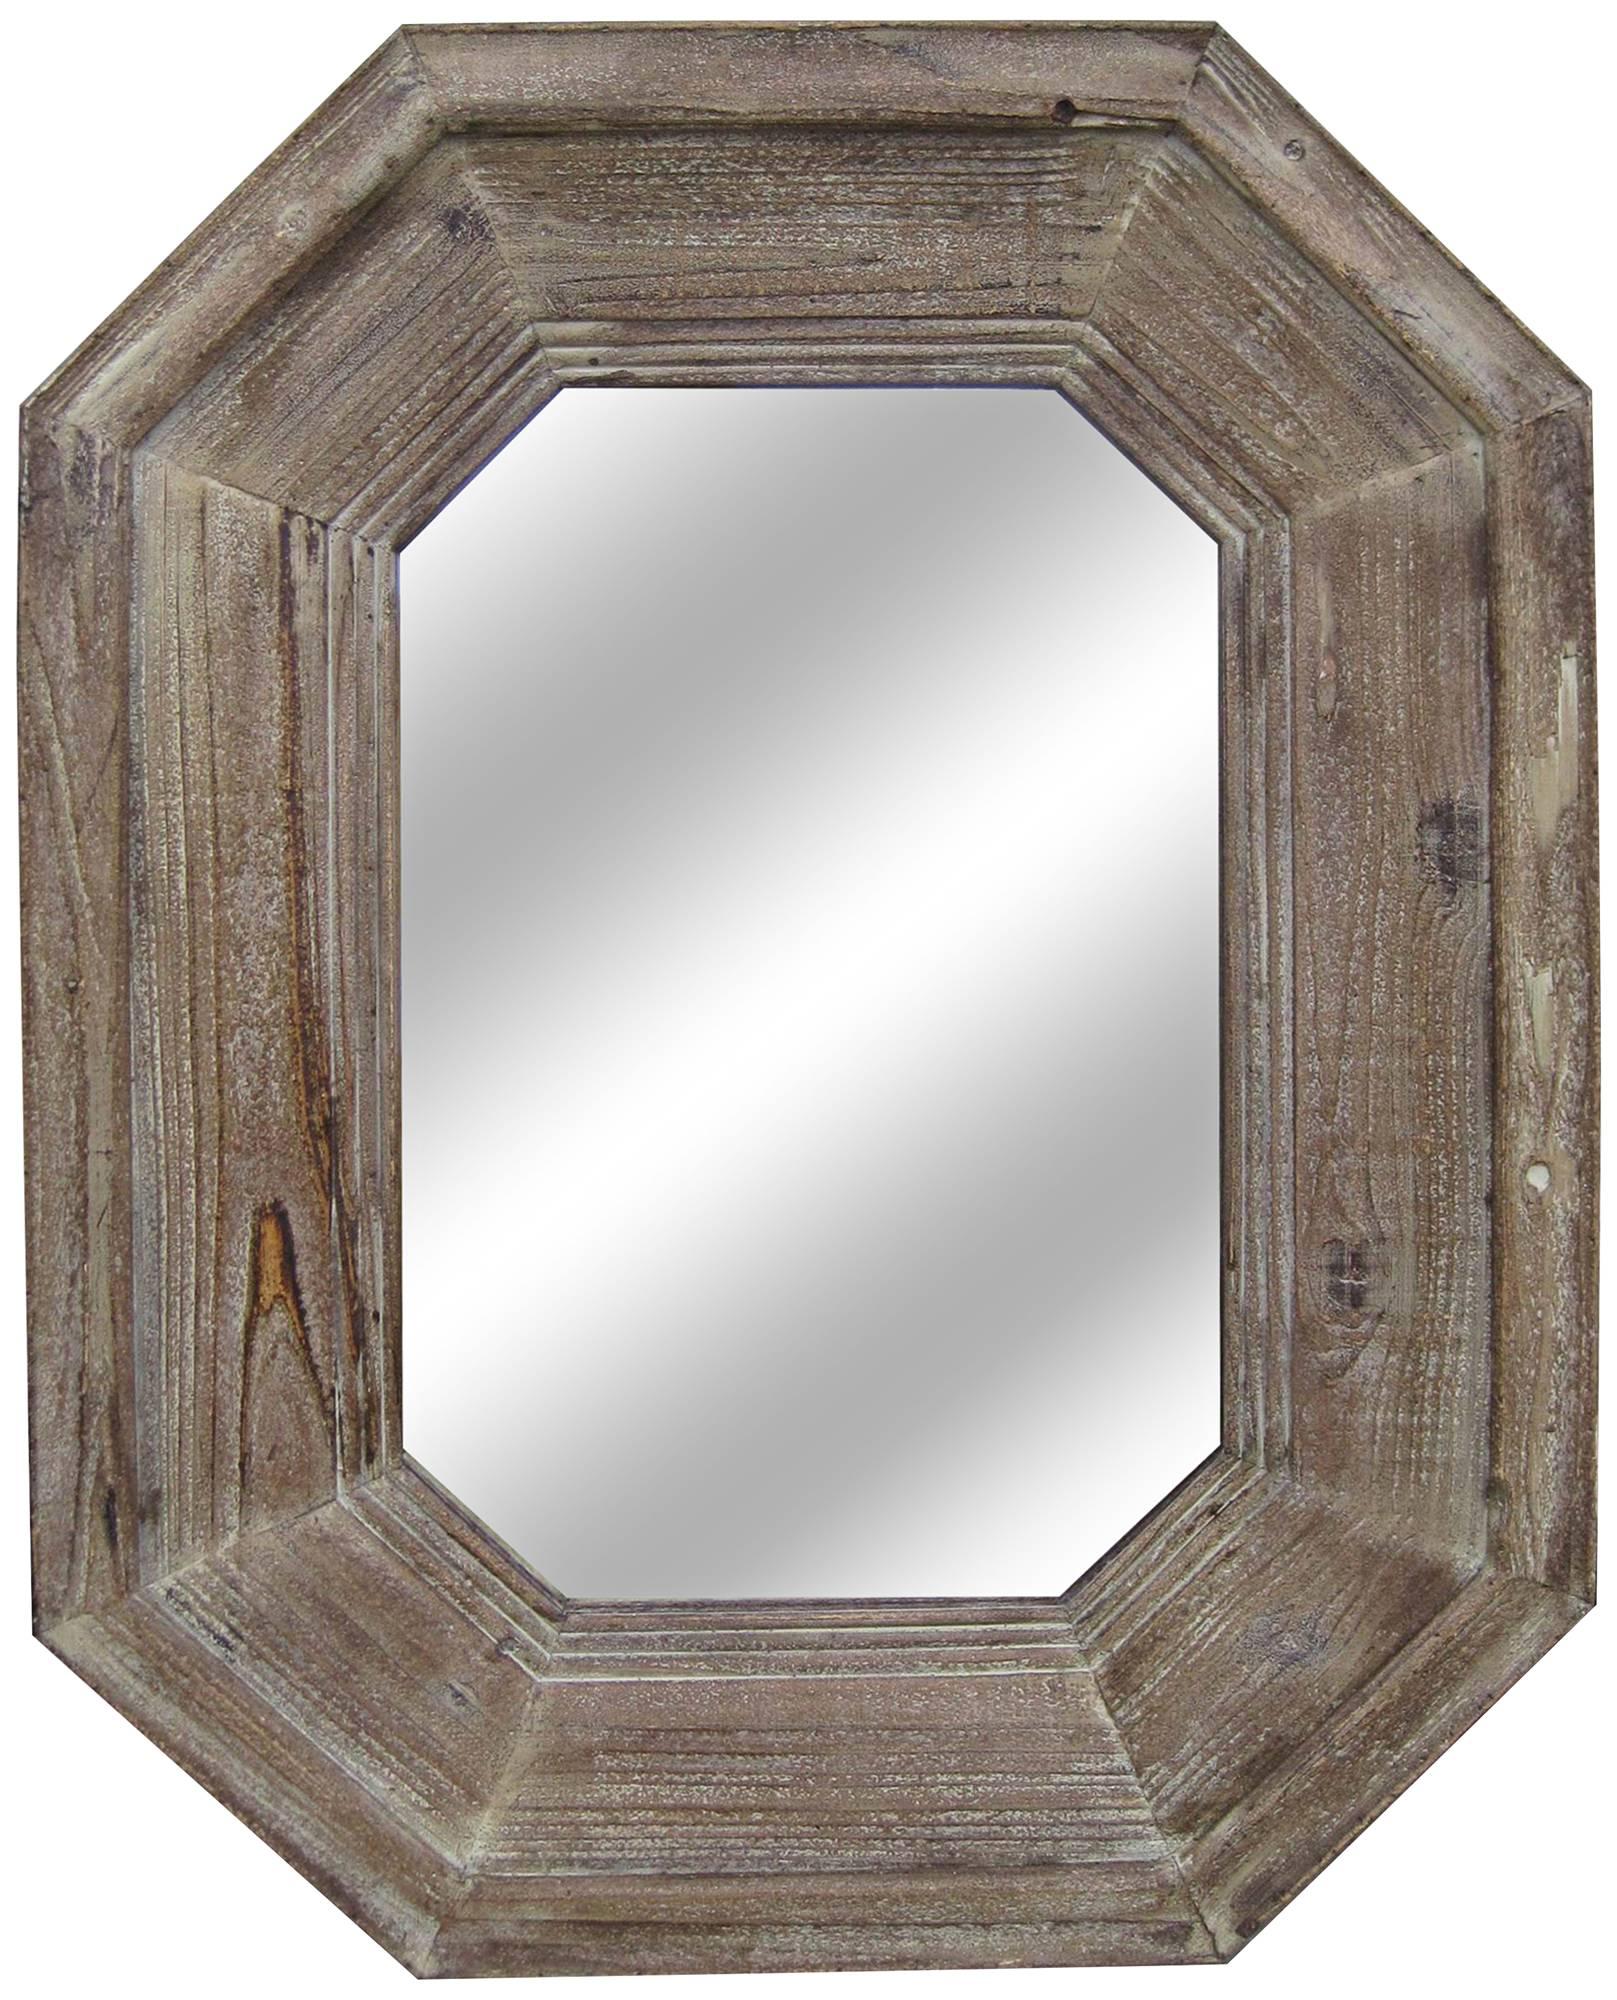 Sawyer distressed wood 28 x 36 1 2 octagon wall mirror